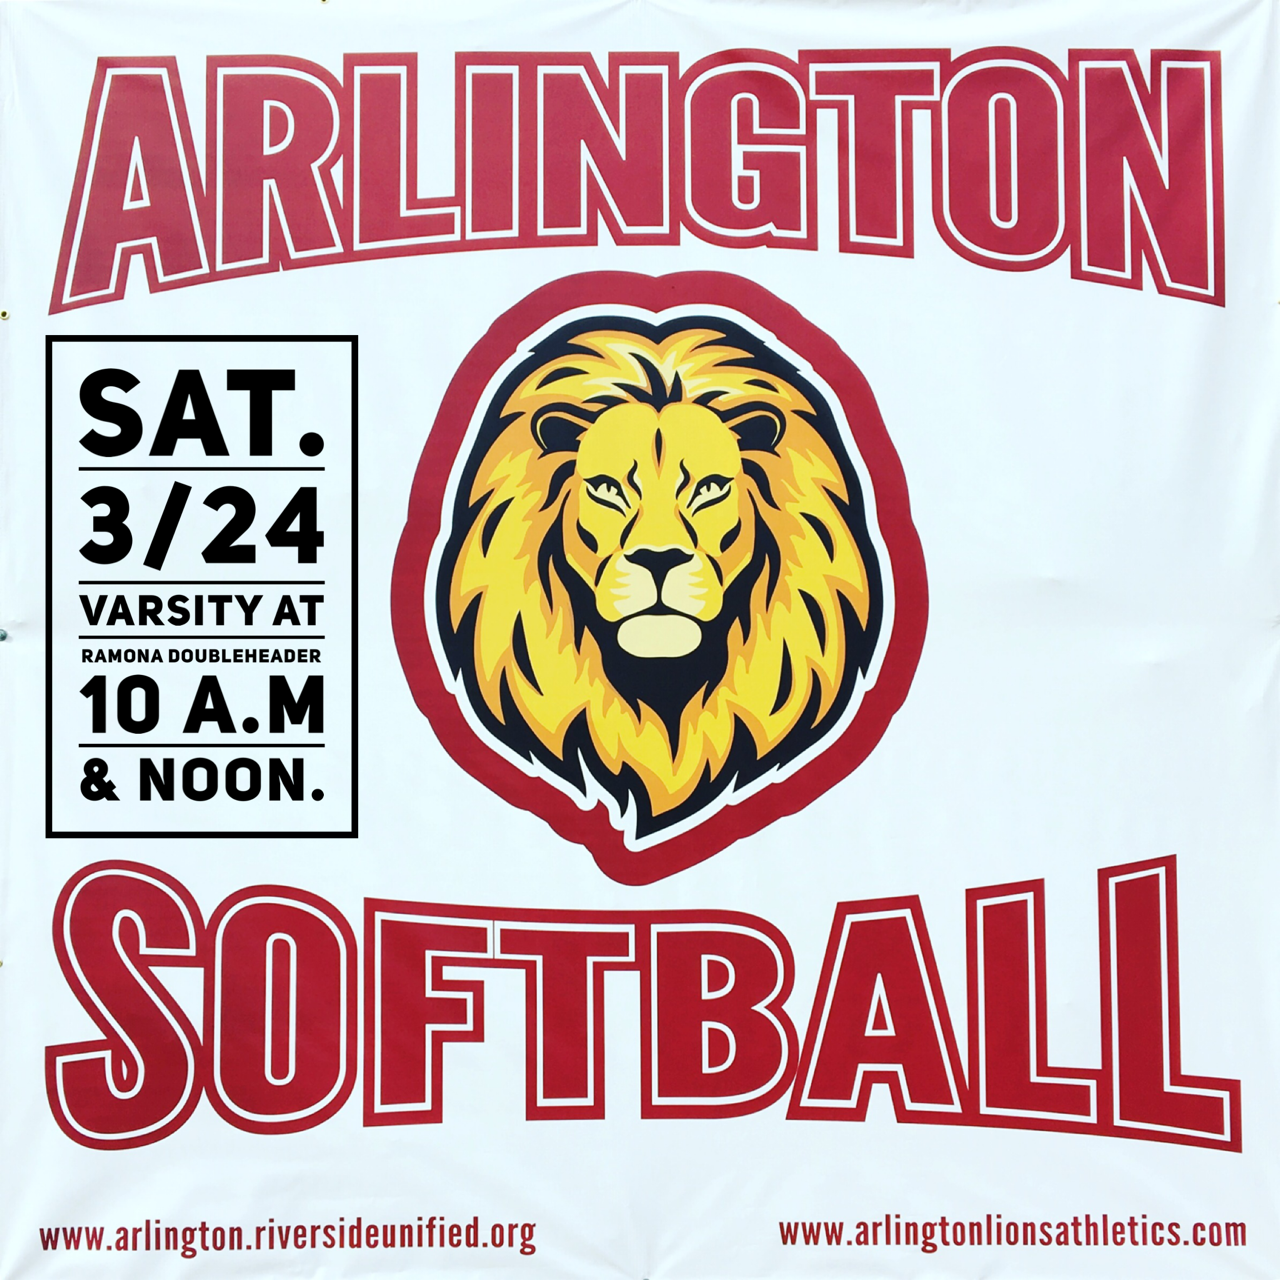 Arlington Varsity Softball at Ramona H.S. on Saturday, 3/24. – Doubleheader 10 a.m. and noon.